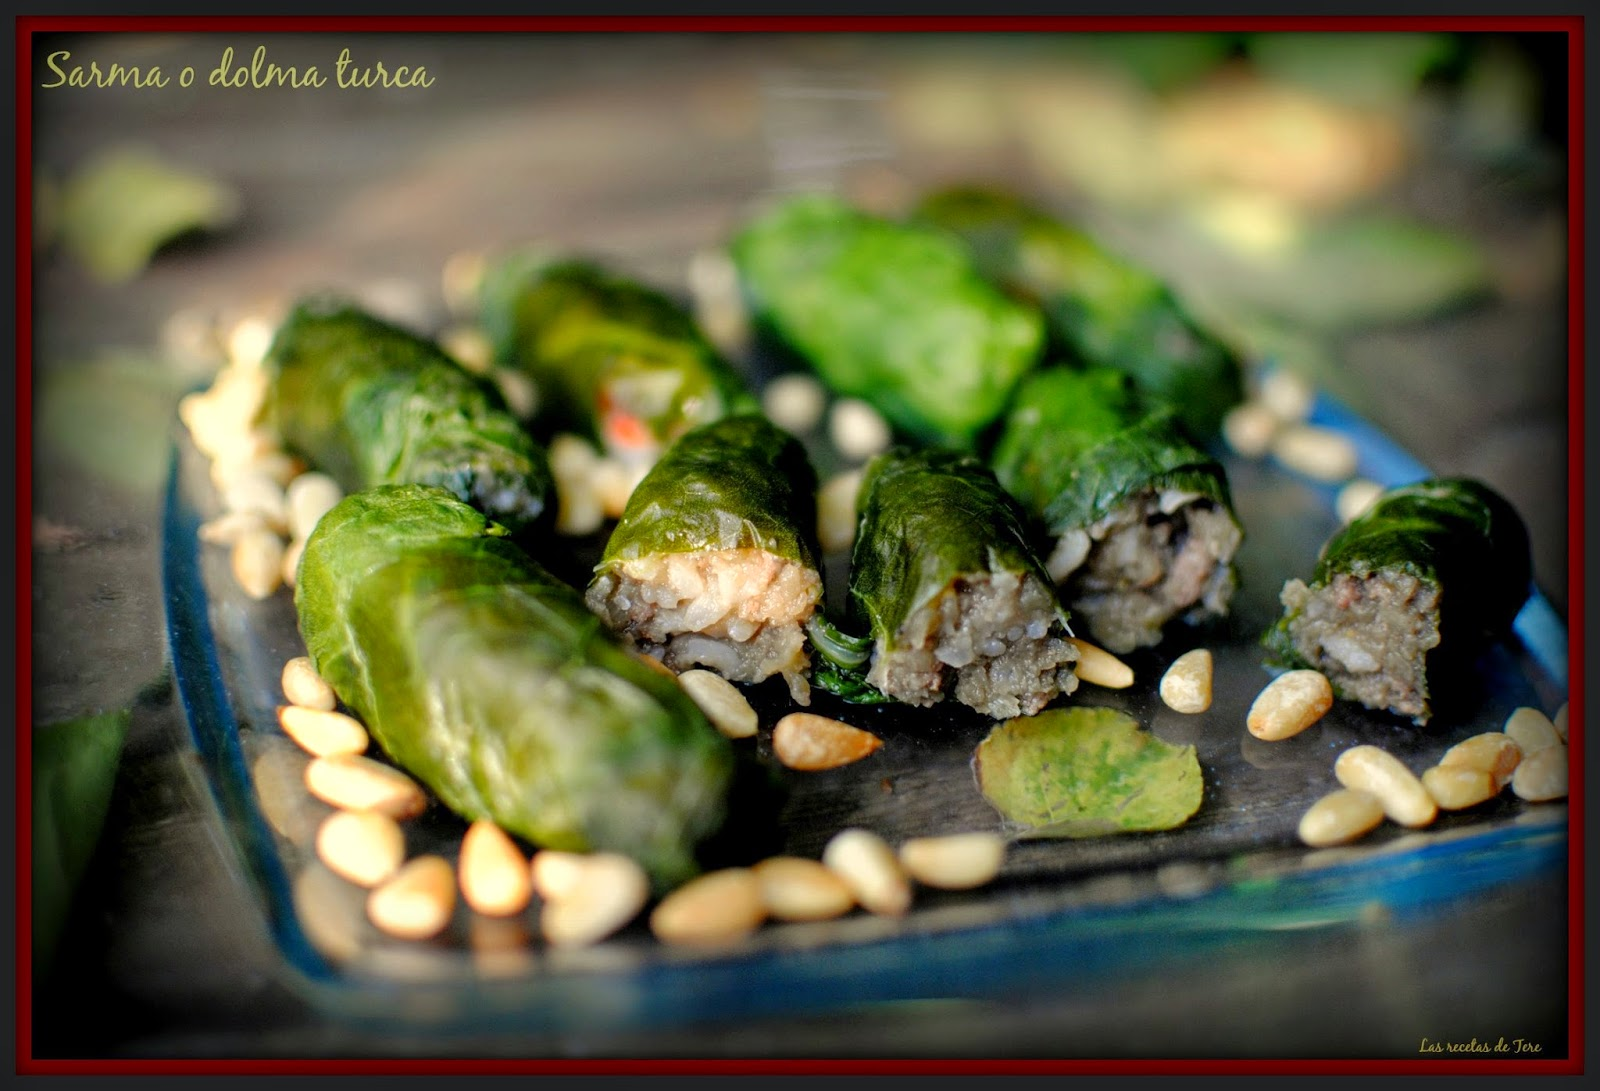 Blog Las recetas de Tere Sarma o dolma turca o cmo